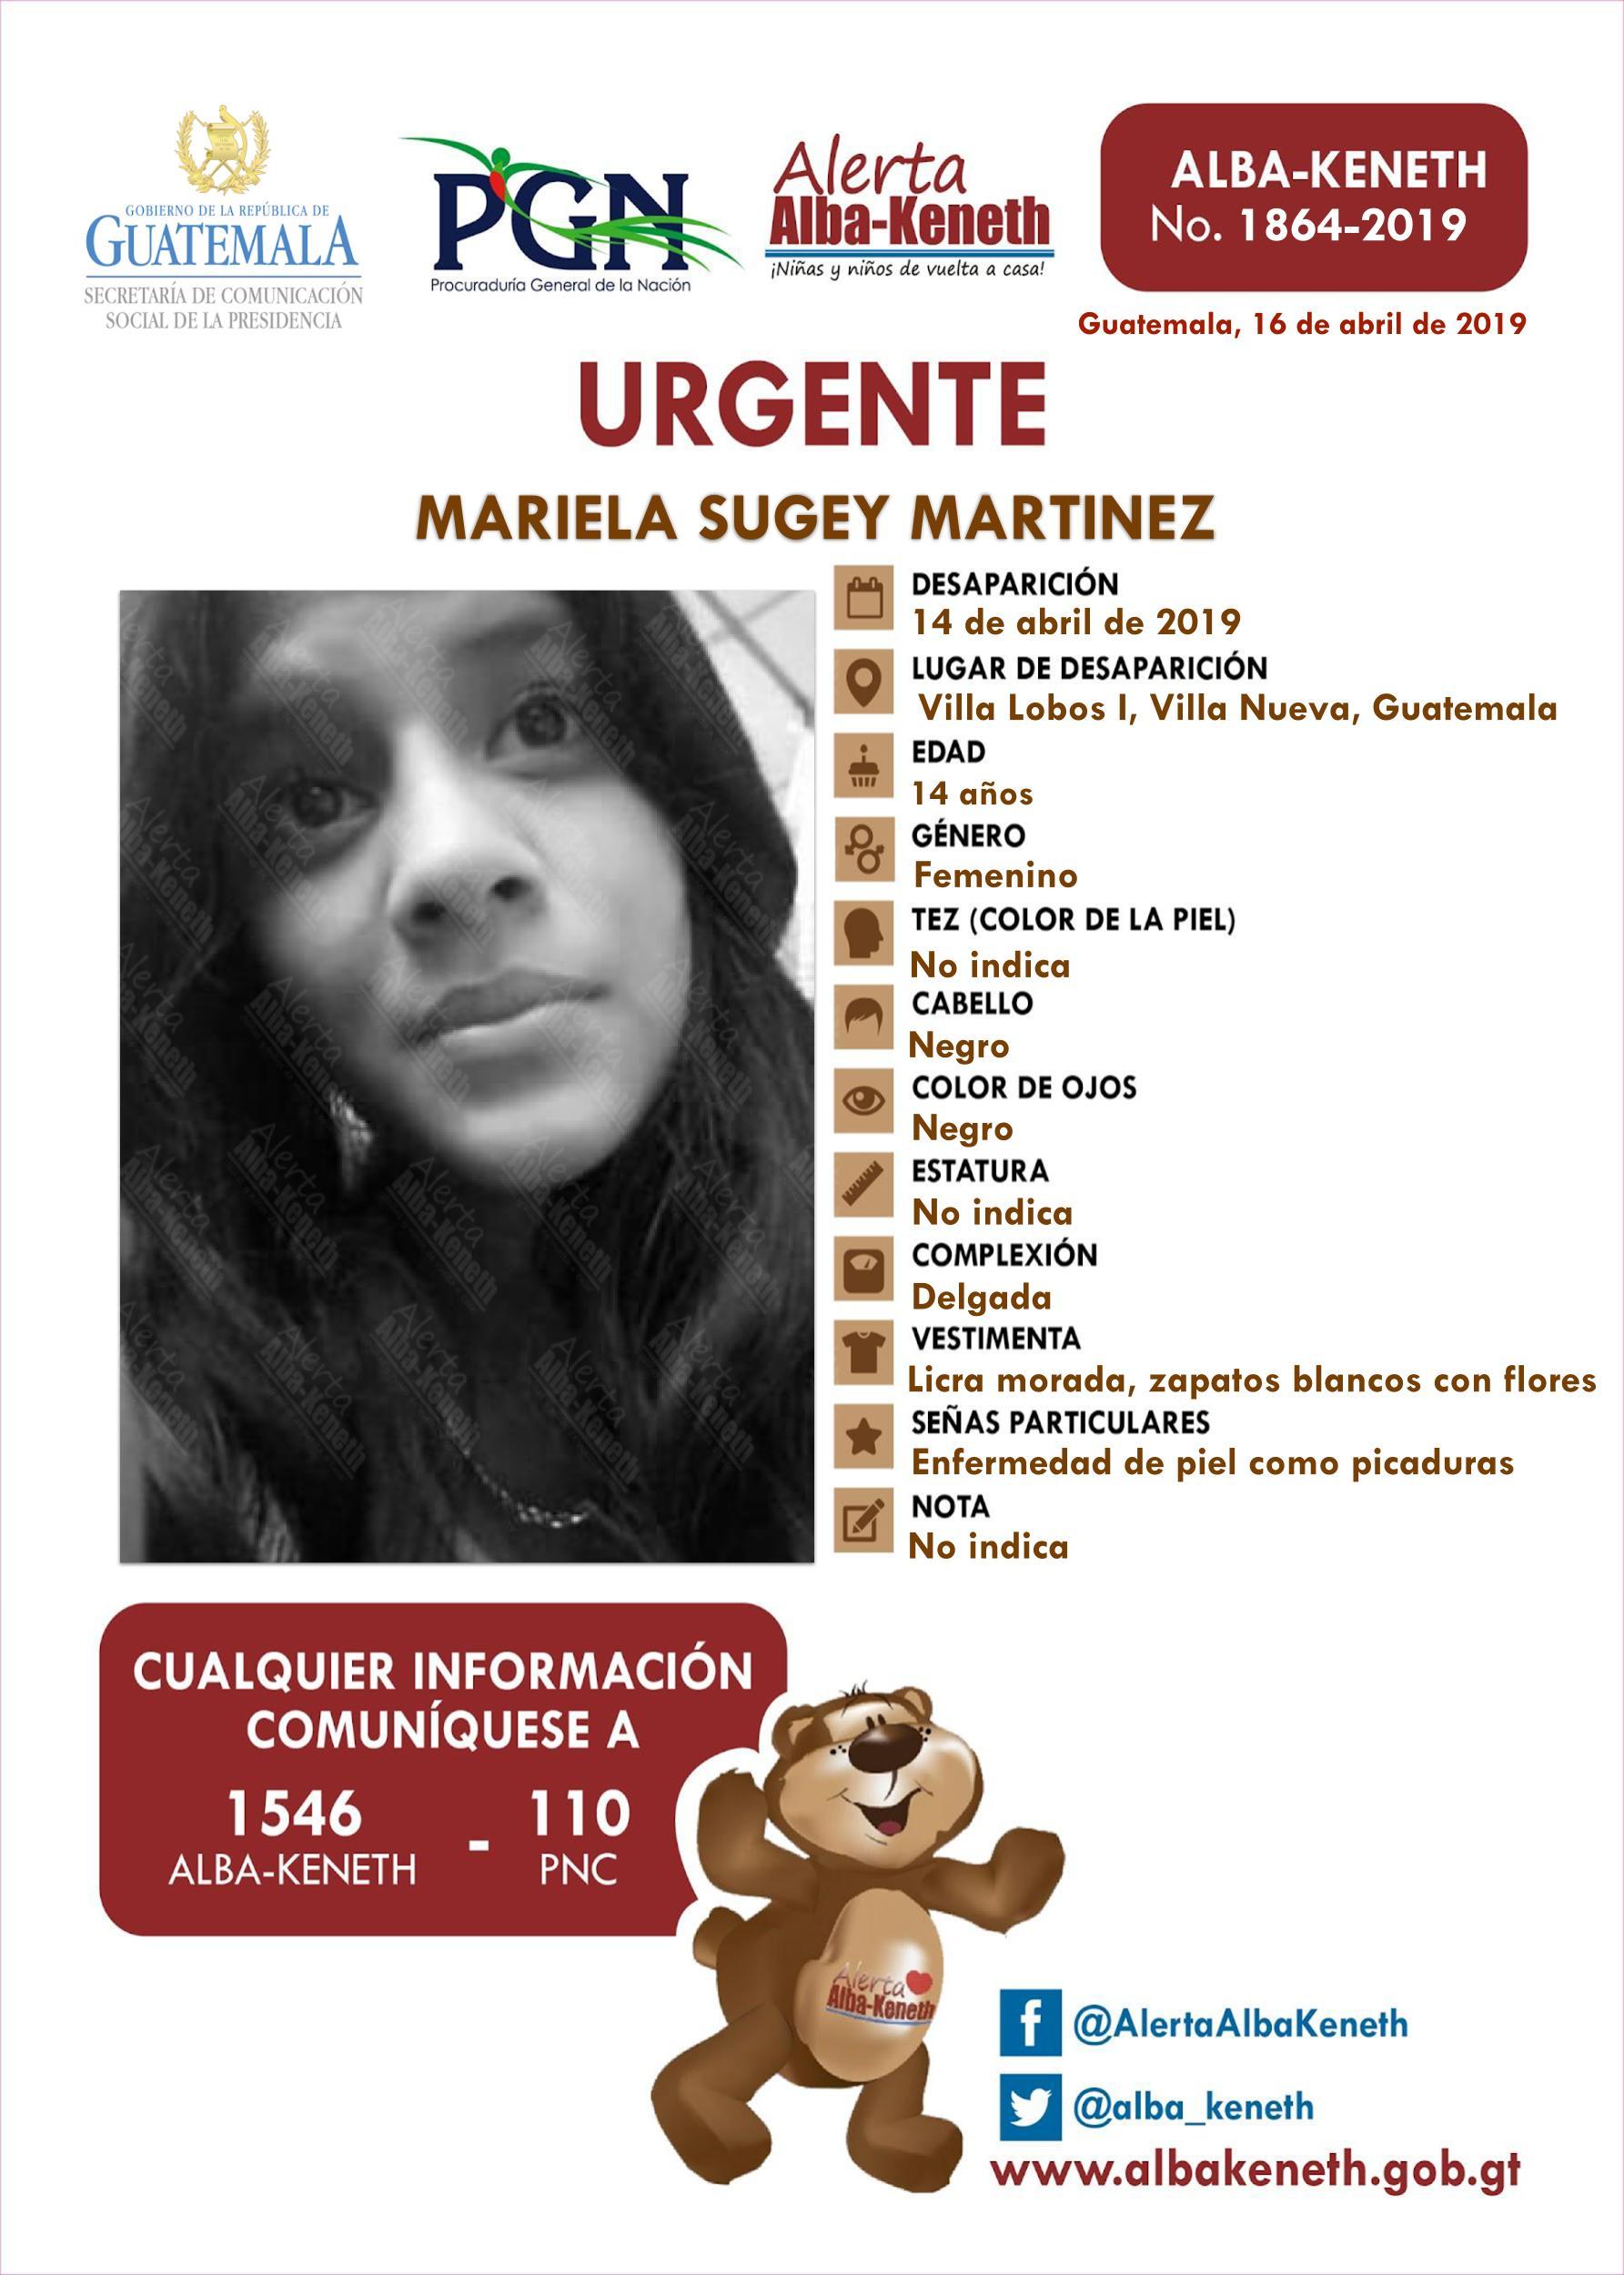 Mariela Sugey Martinez